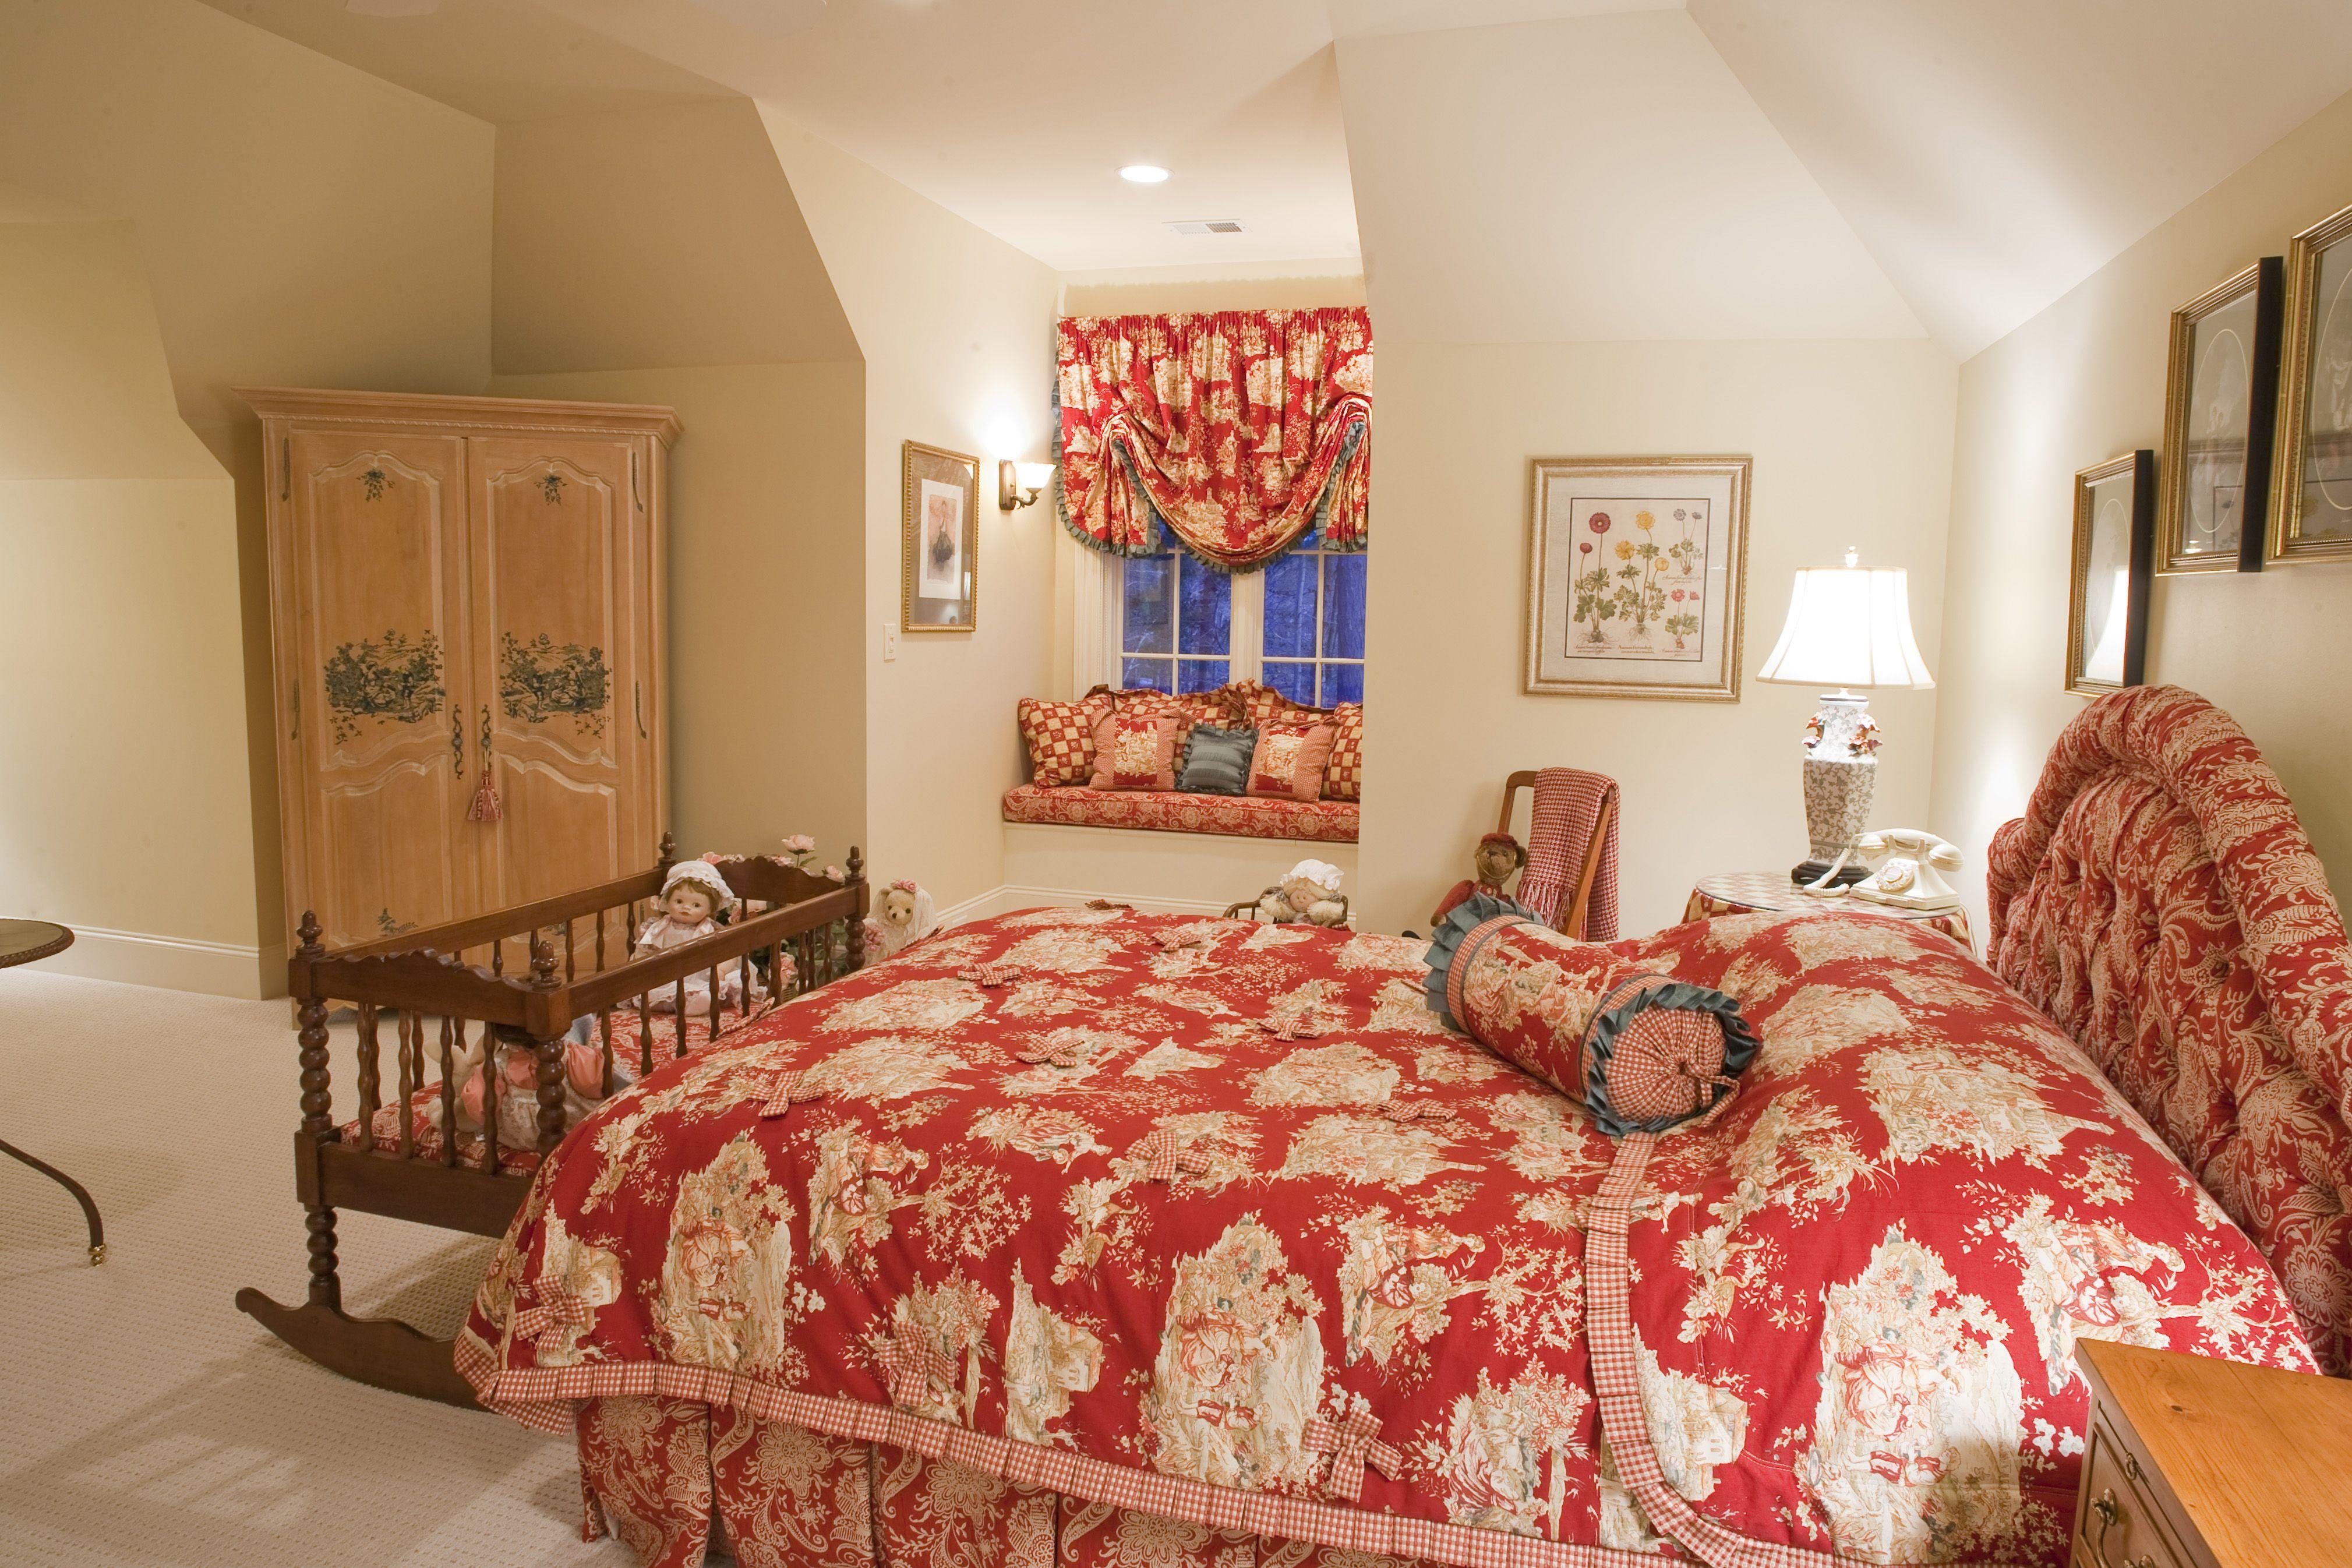 #bedroom #interiors #interiordesign #kellycruzinteriors